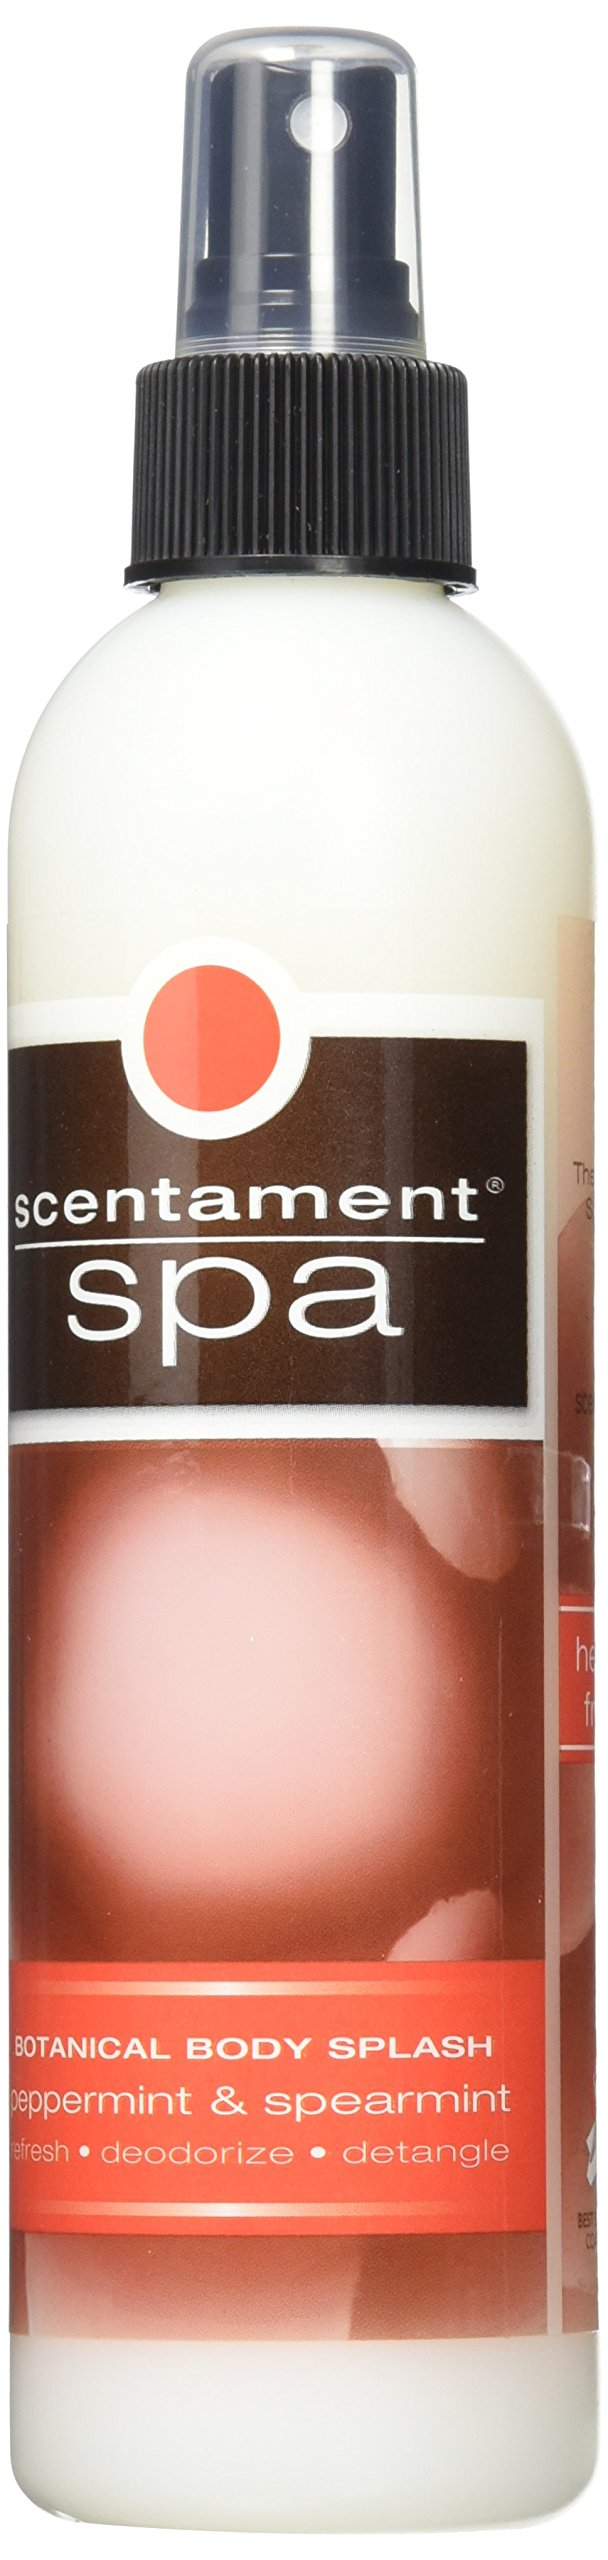 Best Shot Pet Scentament Spa Herbal Mint Body Splash Spray, 8 oz